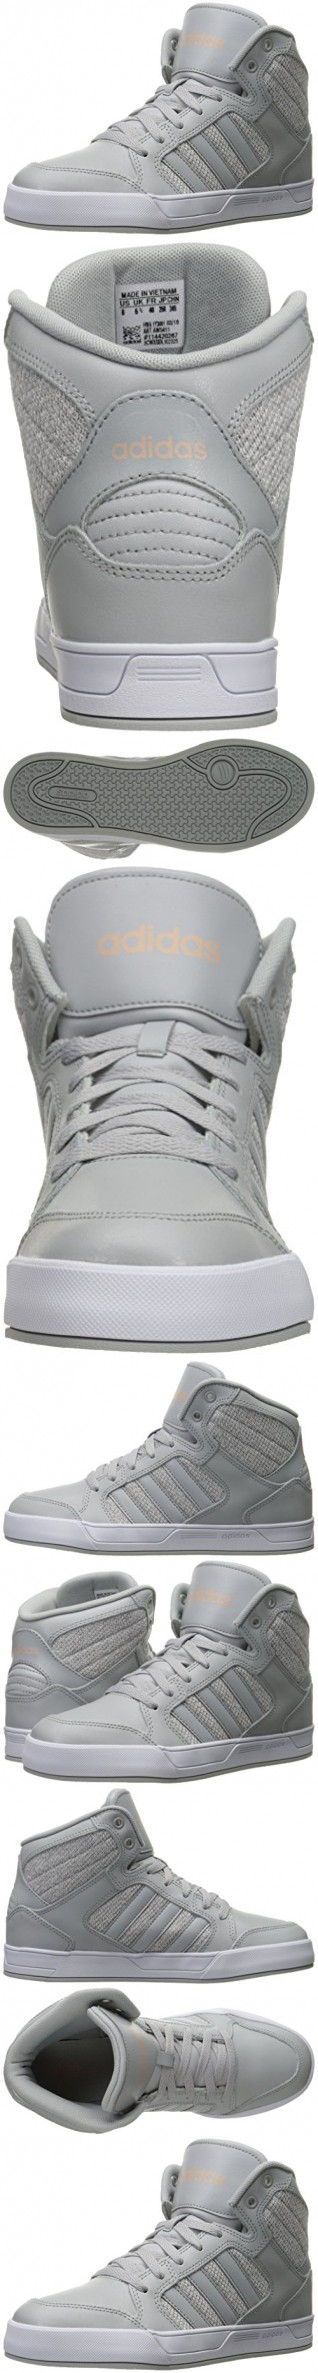 adidas neo women's raleigh metà w della scarpa, chiara onix / luce